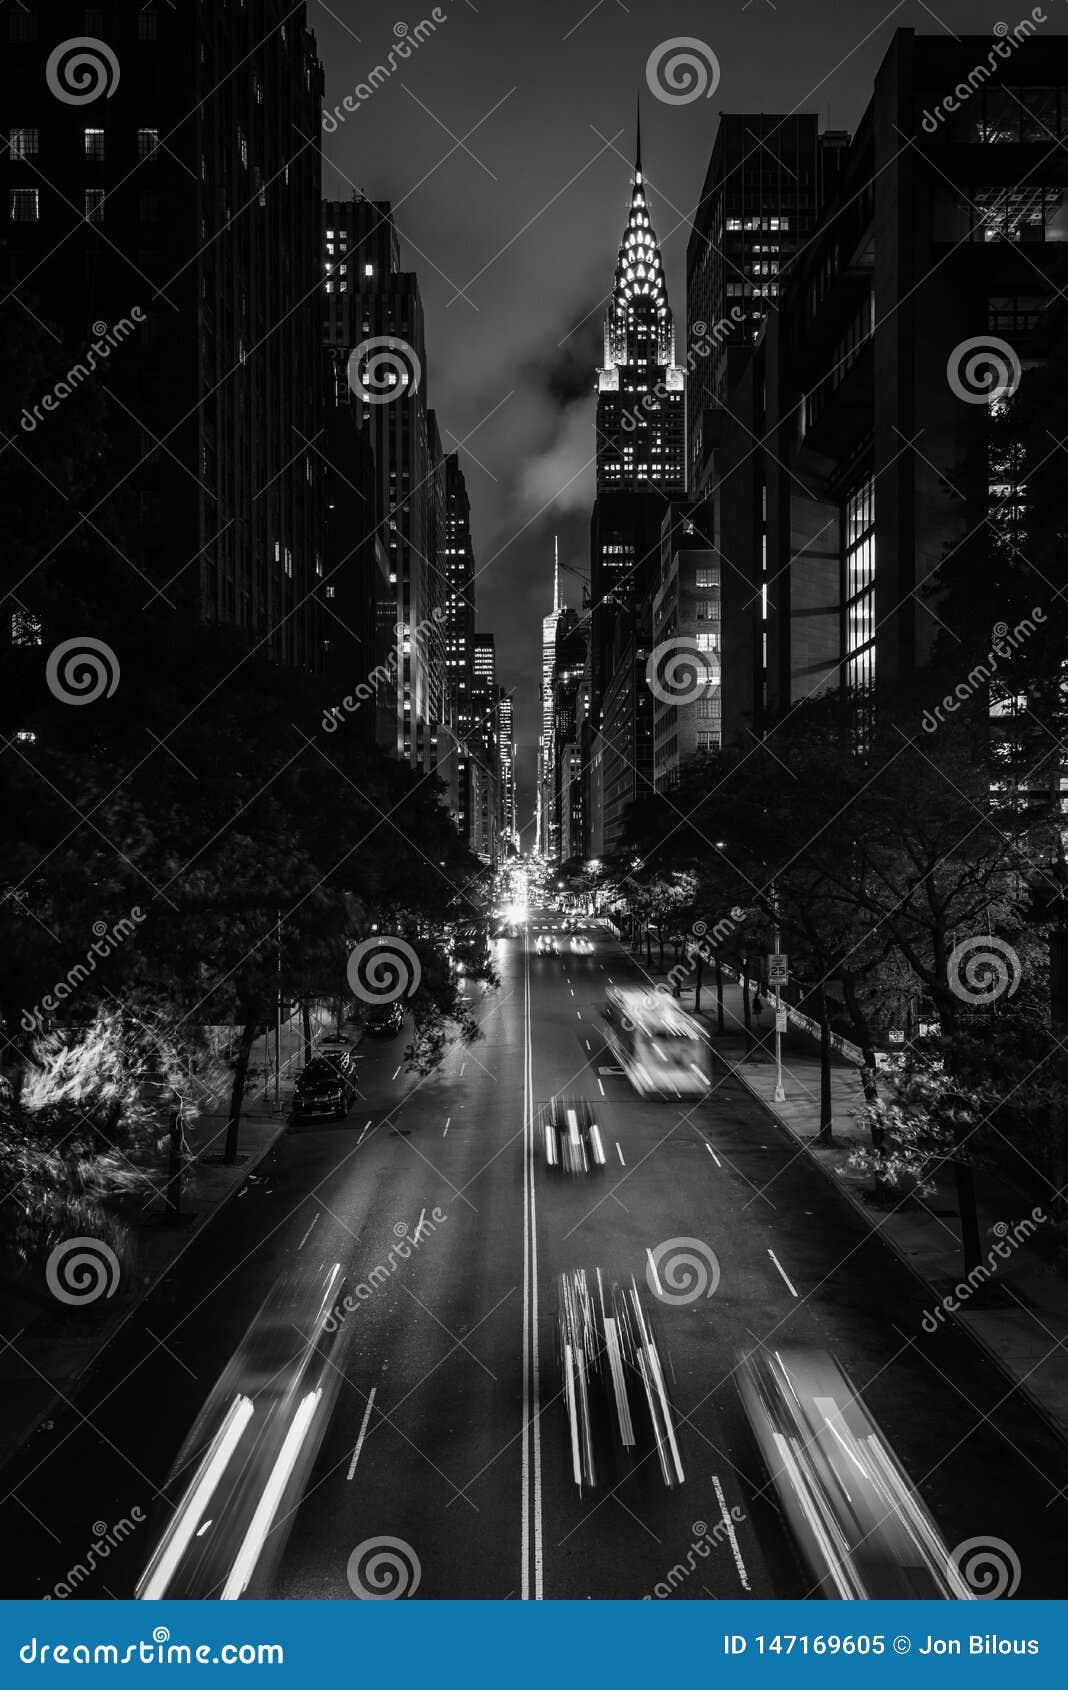 42nd Street at night from Tudor City, in Midtown Manhattan, New York City